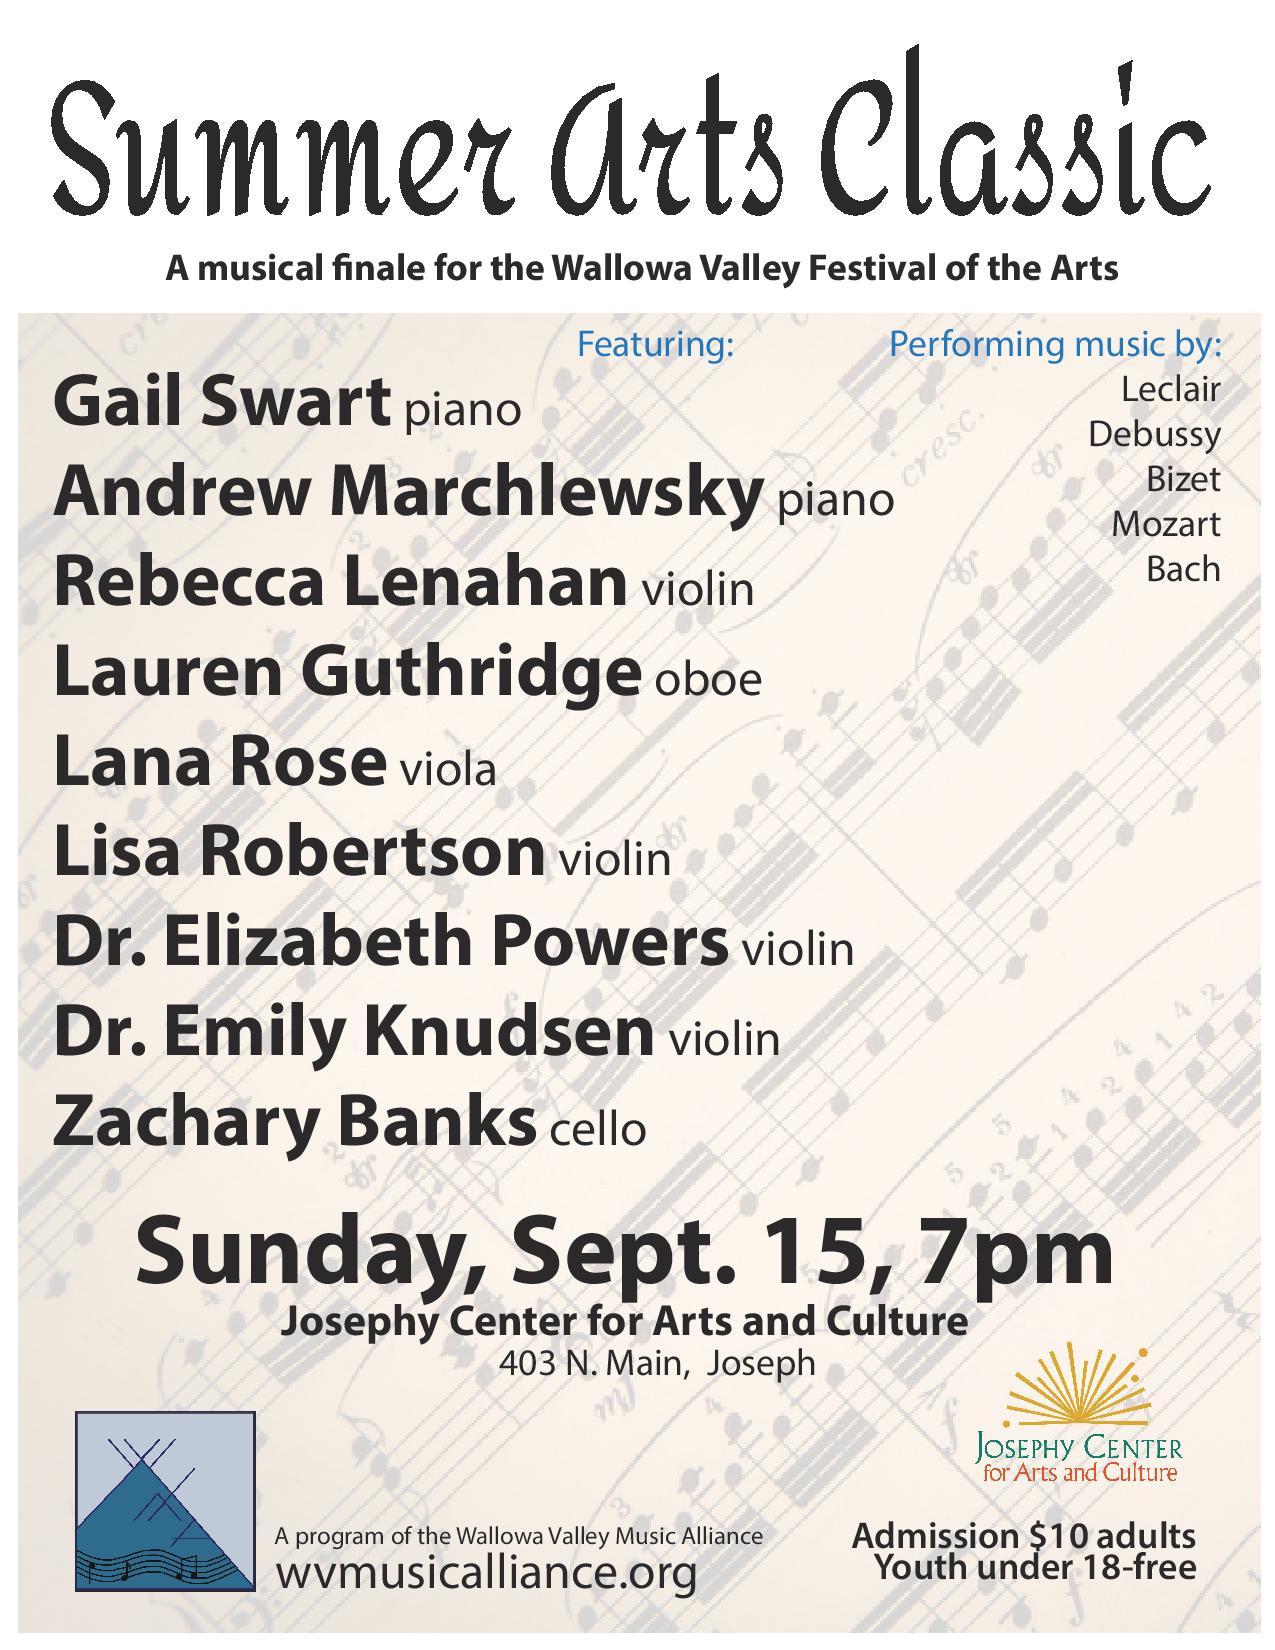 Festival of Arts Classical Concert